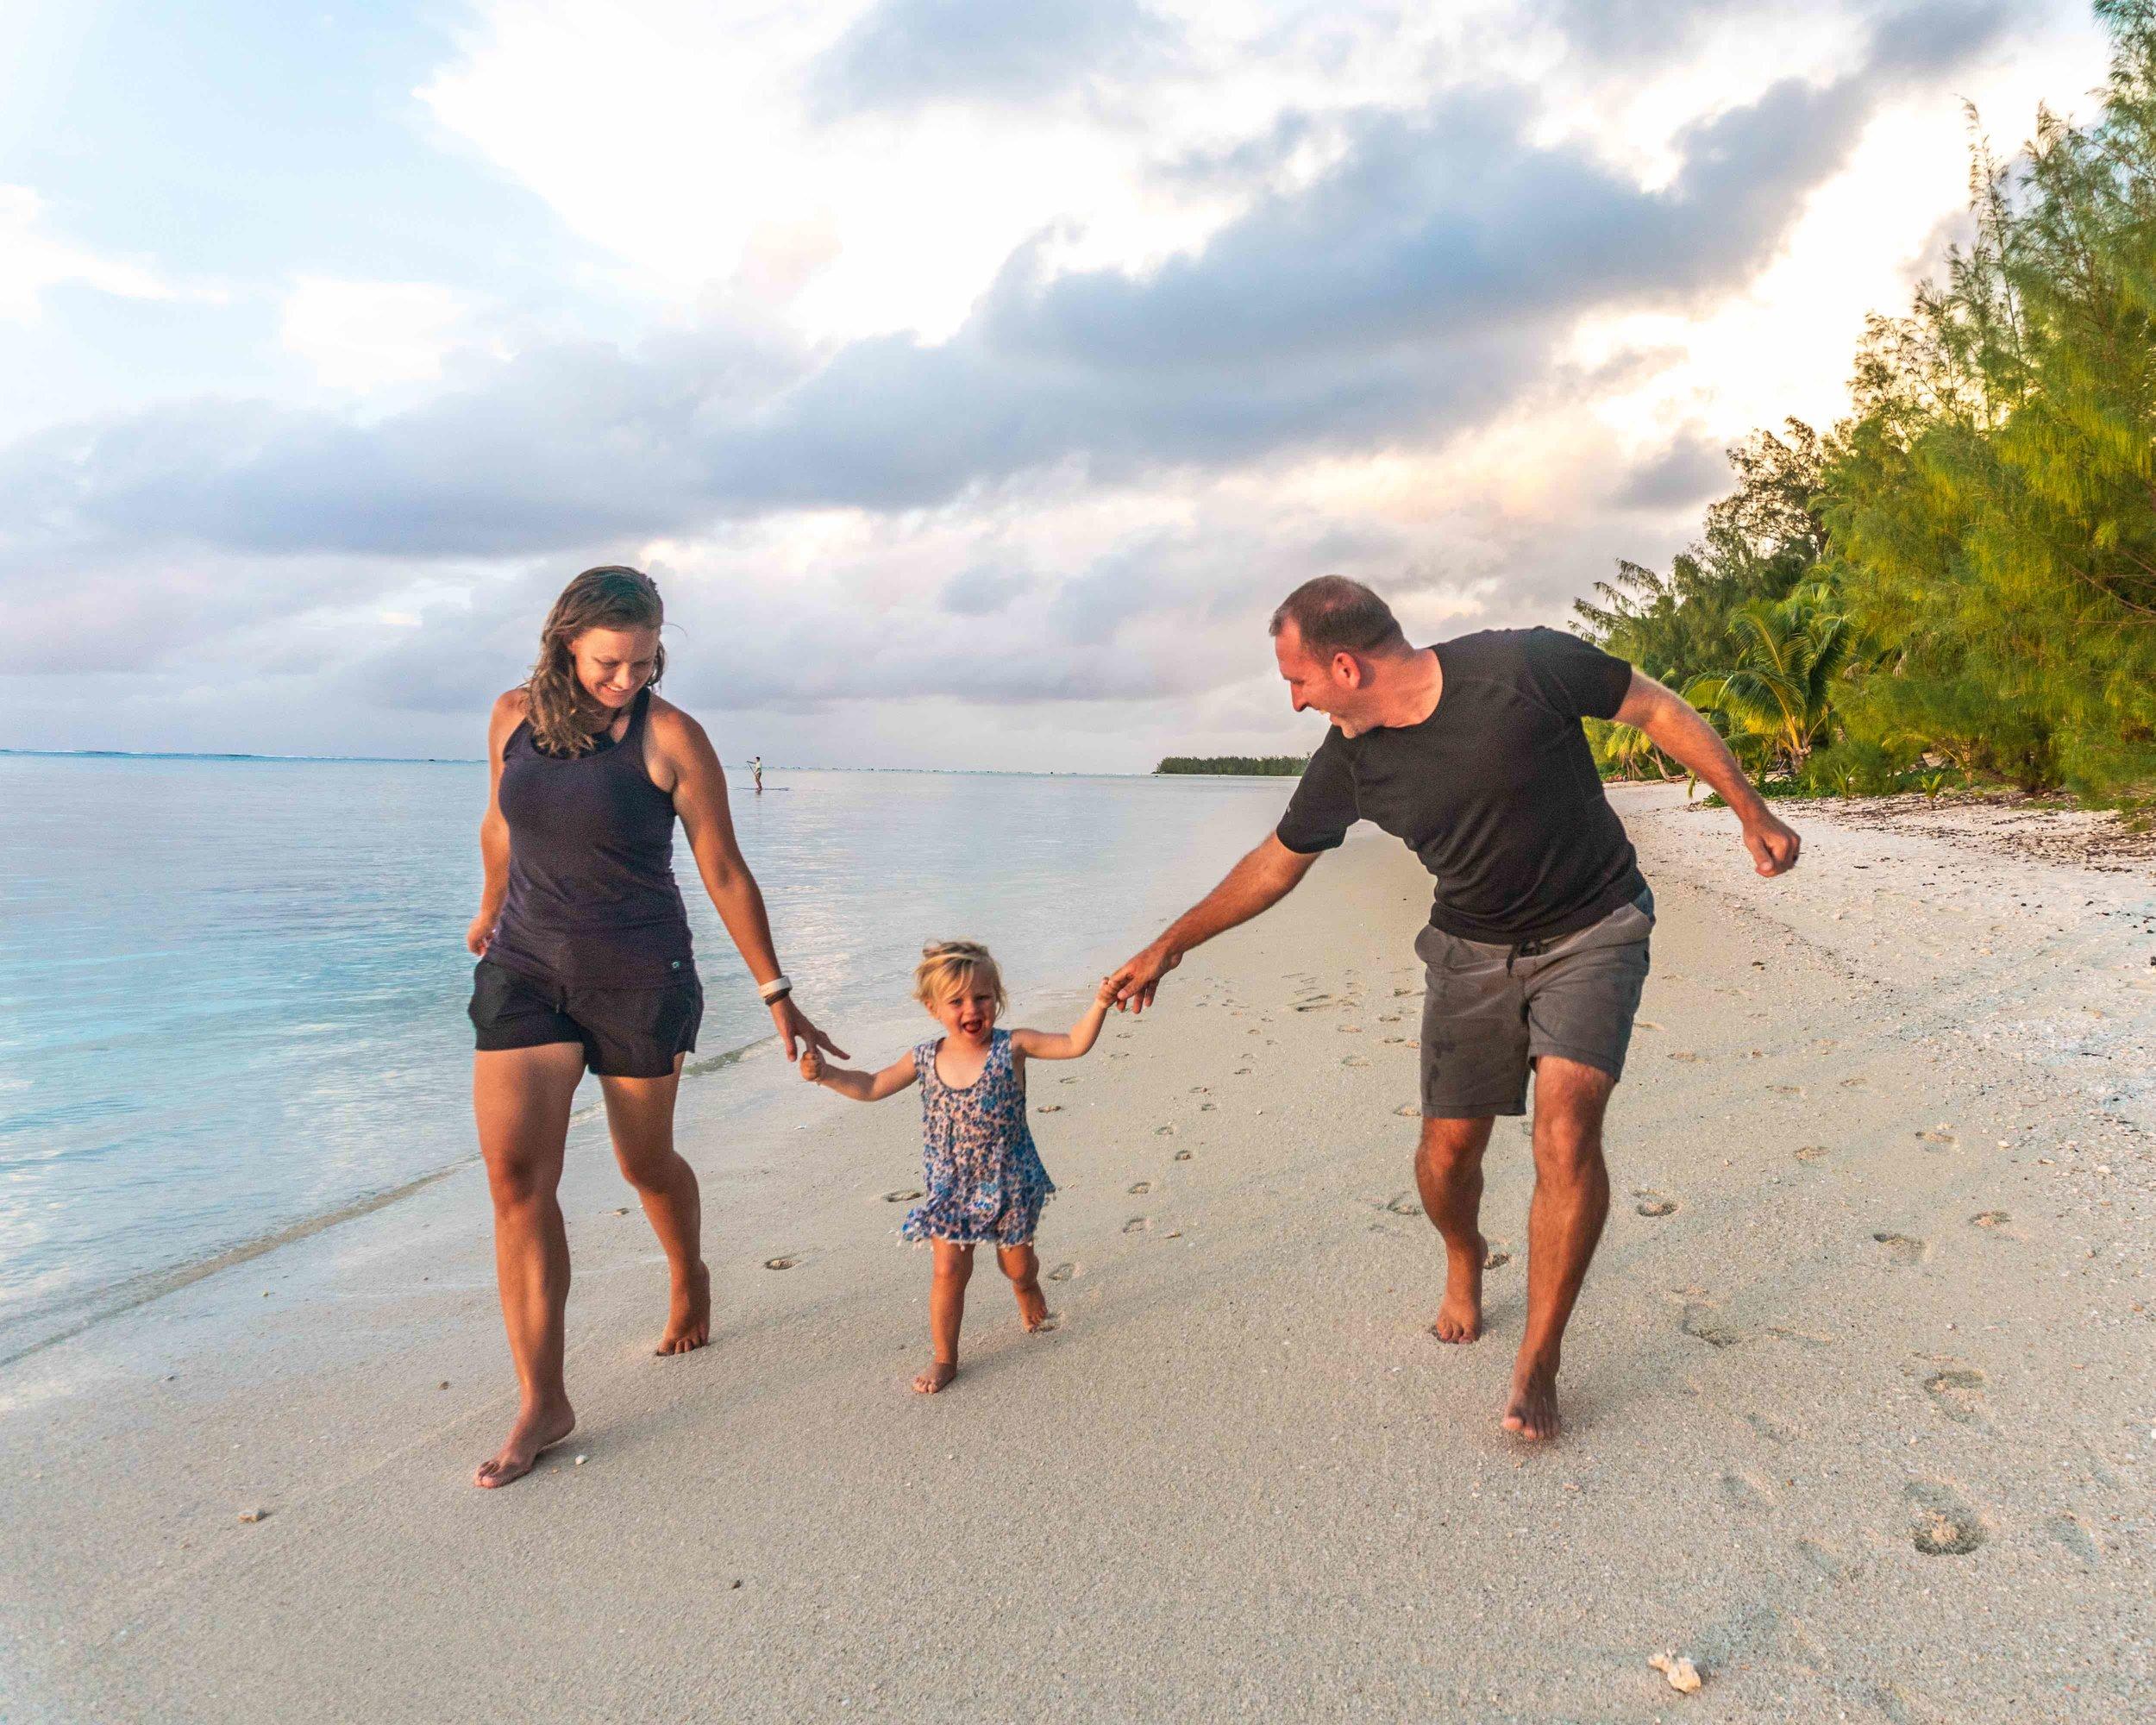 Lifestyle_family_beach_island_sunset_running.jpg